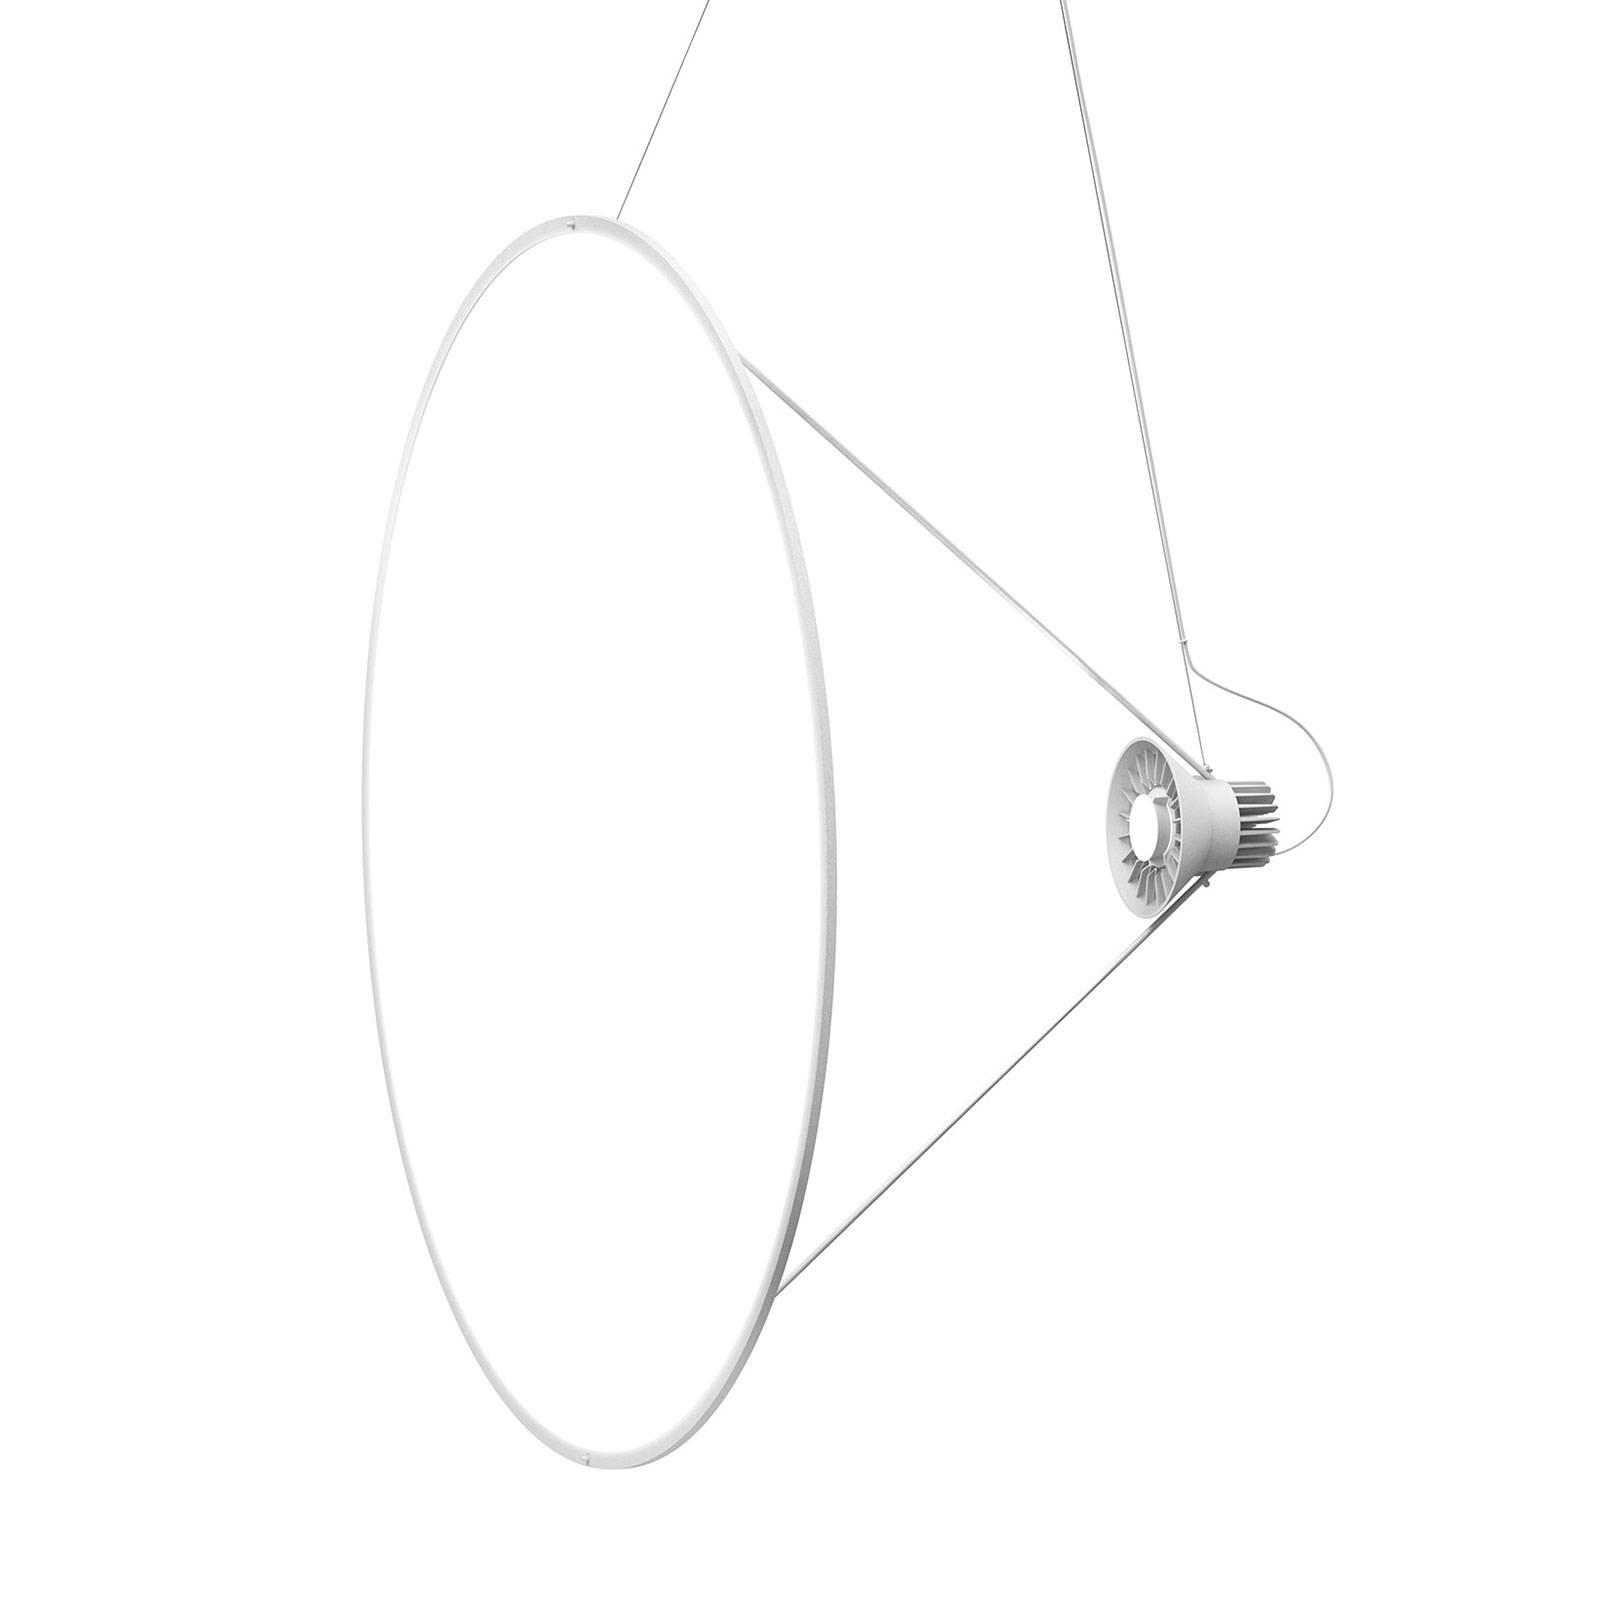 Luceplan Amisol LED hanglamp Ø 110cm opaalwit